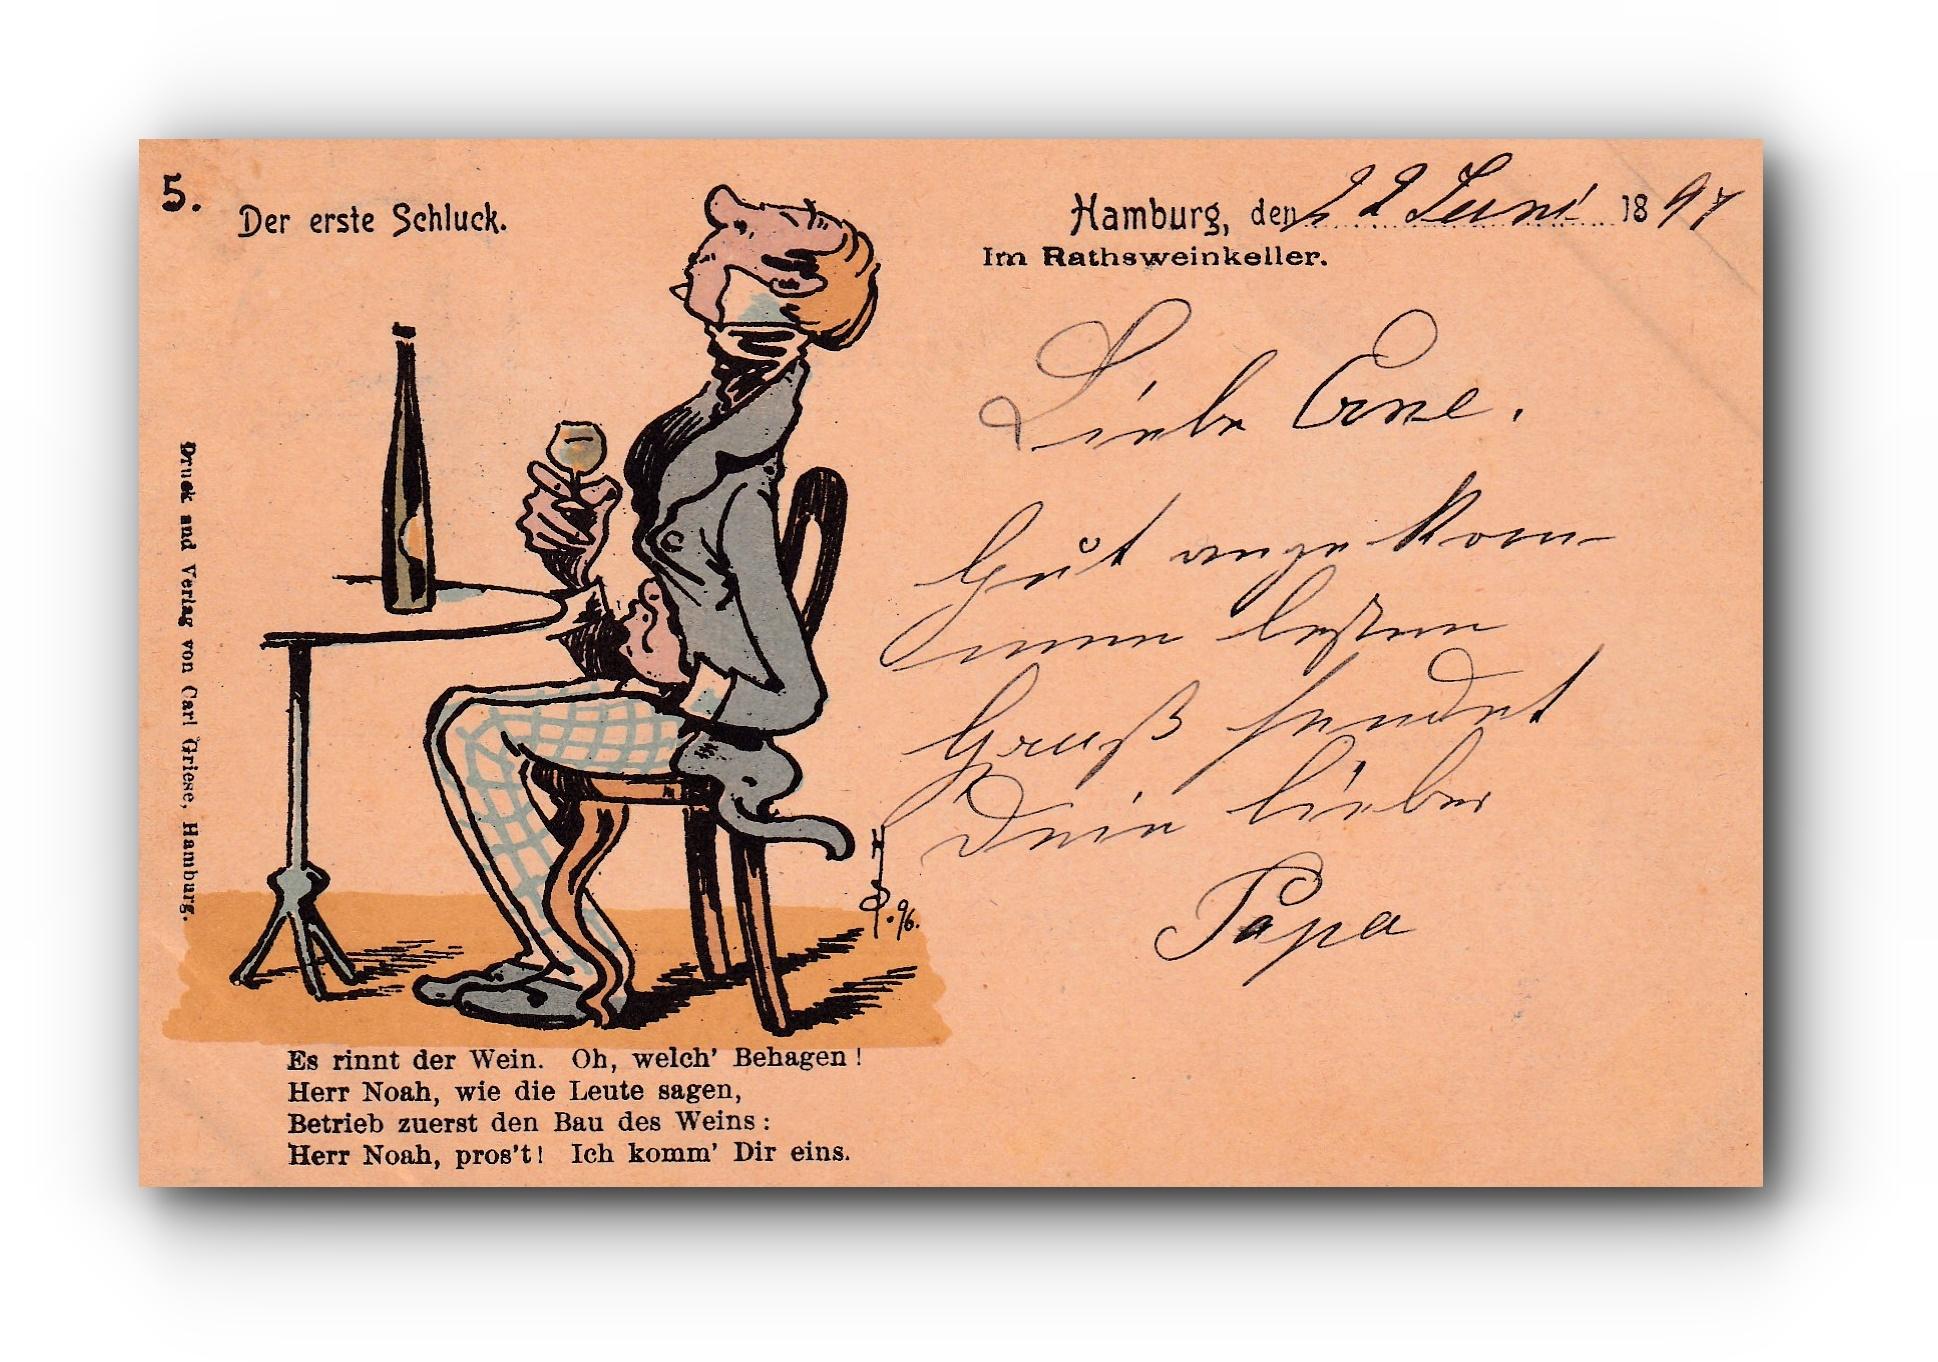 Der erste Schluck - 22.06.1897 - La première gorgée - Tha first sip